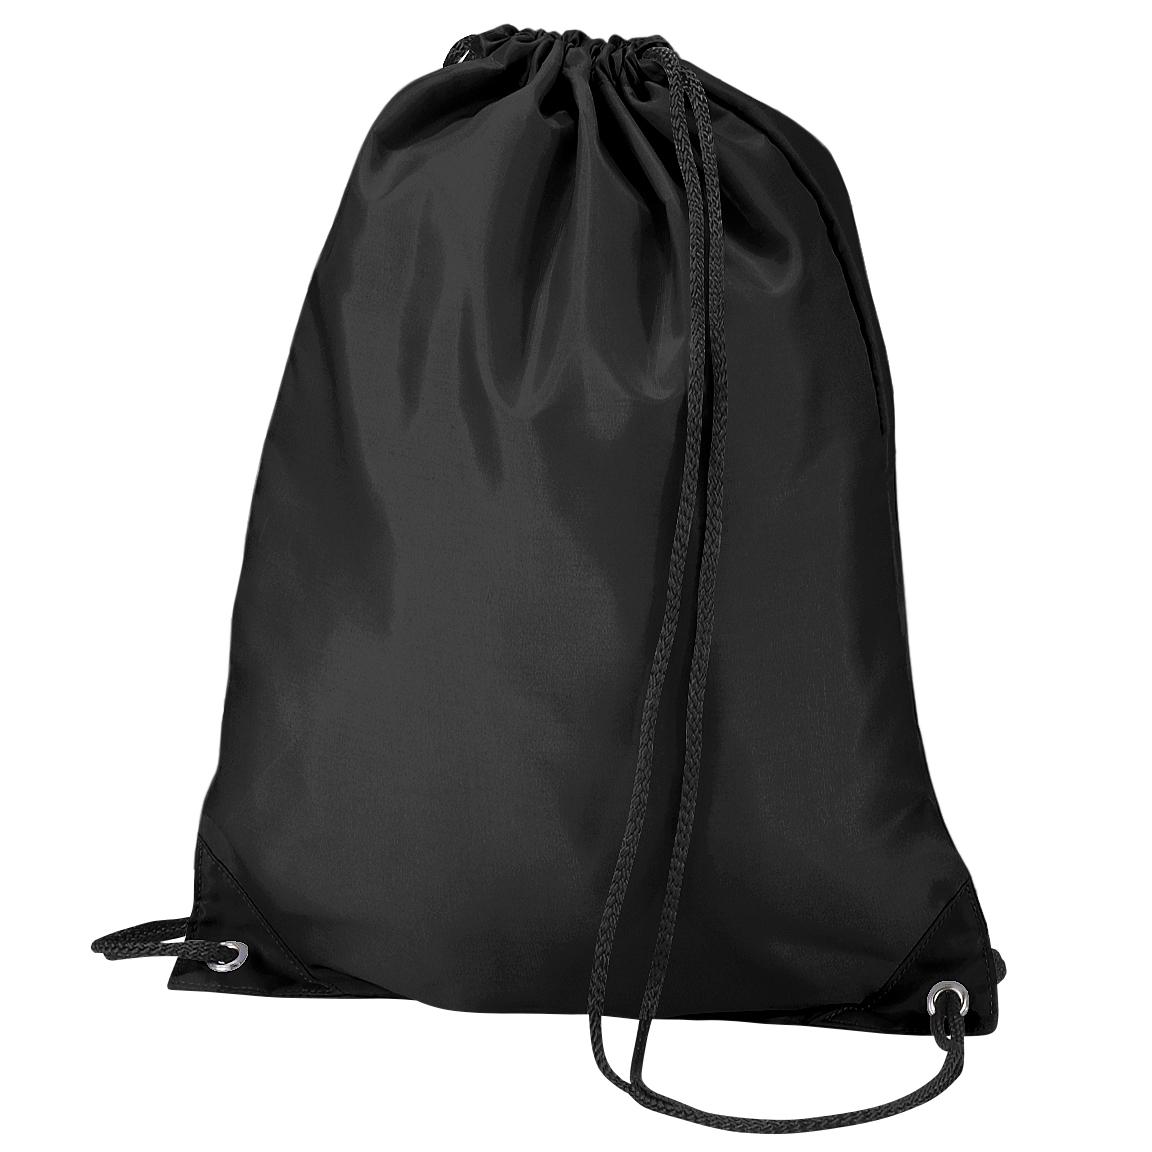 Quadra Gymsac Shoulder Carry Bag - 7 Litres (Pack of 2) (One Size) (Black)